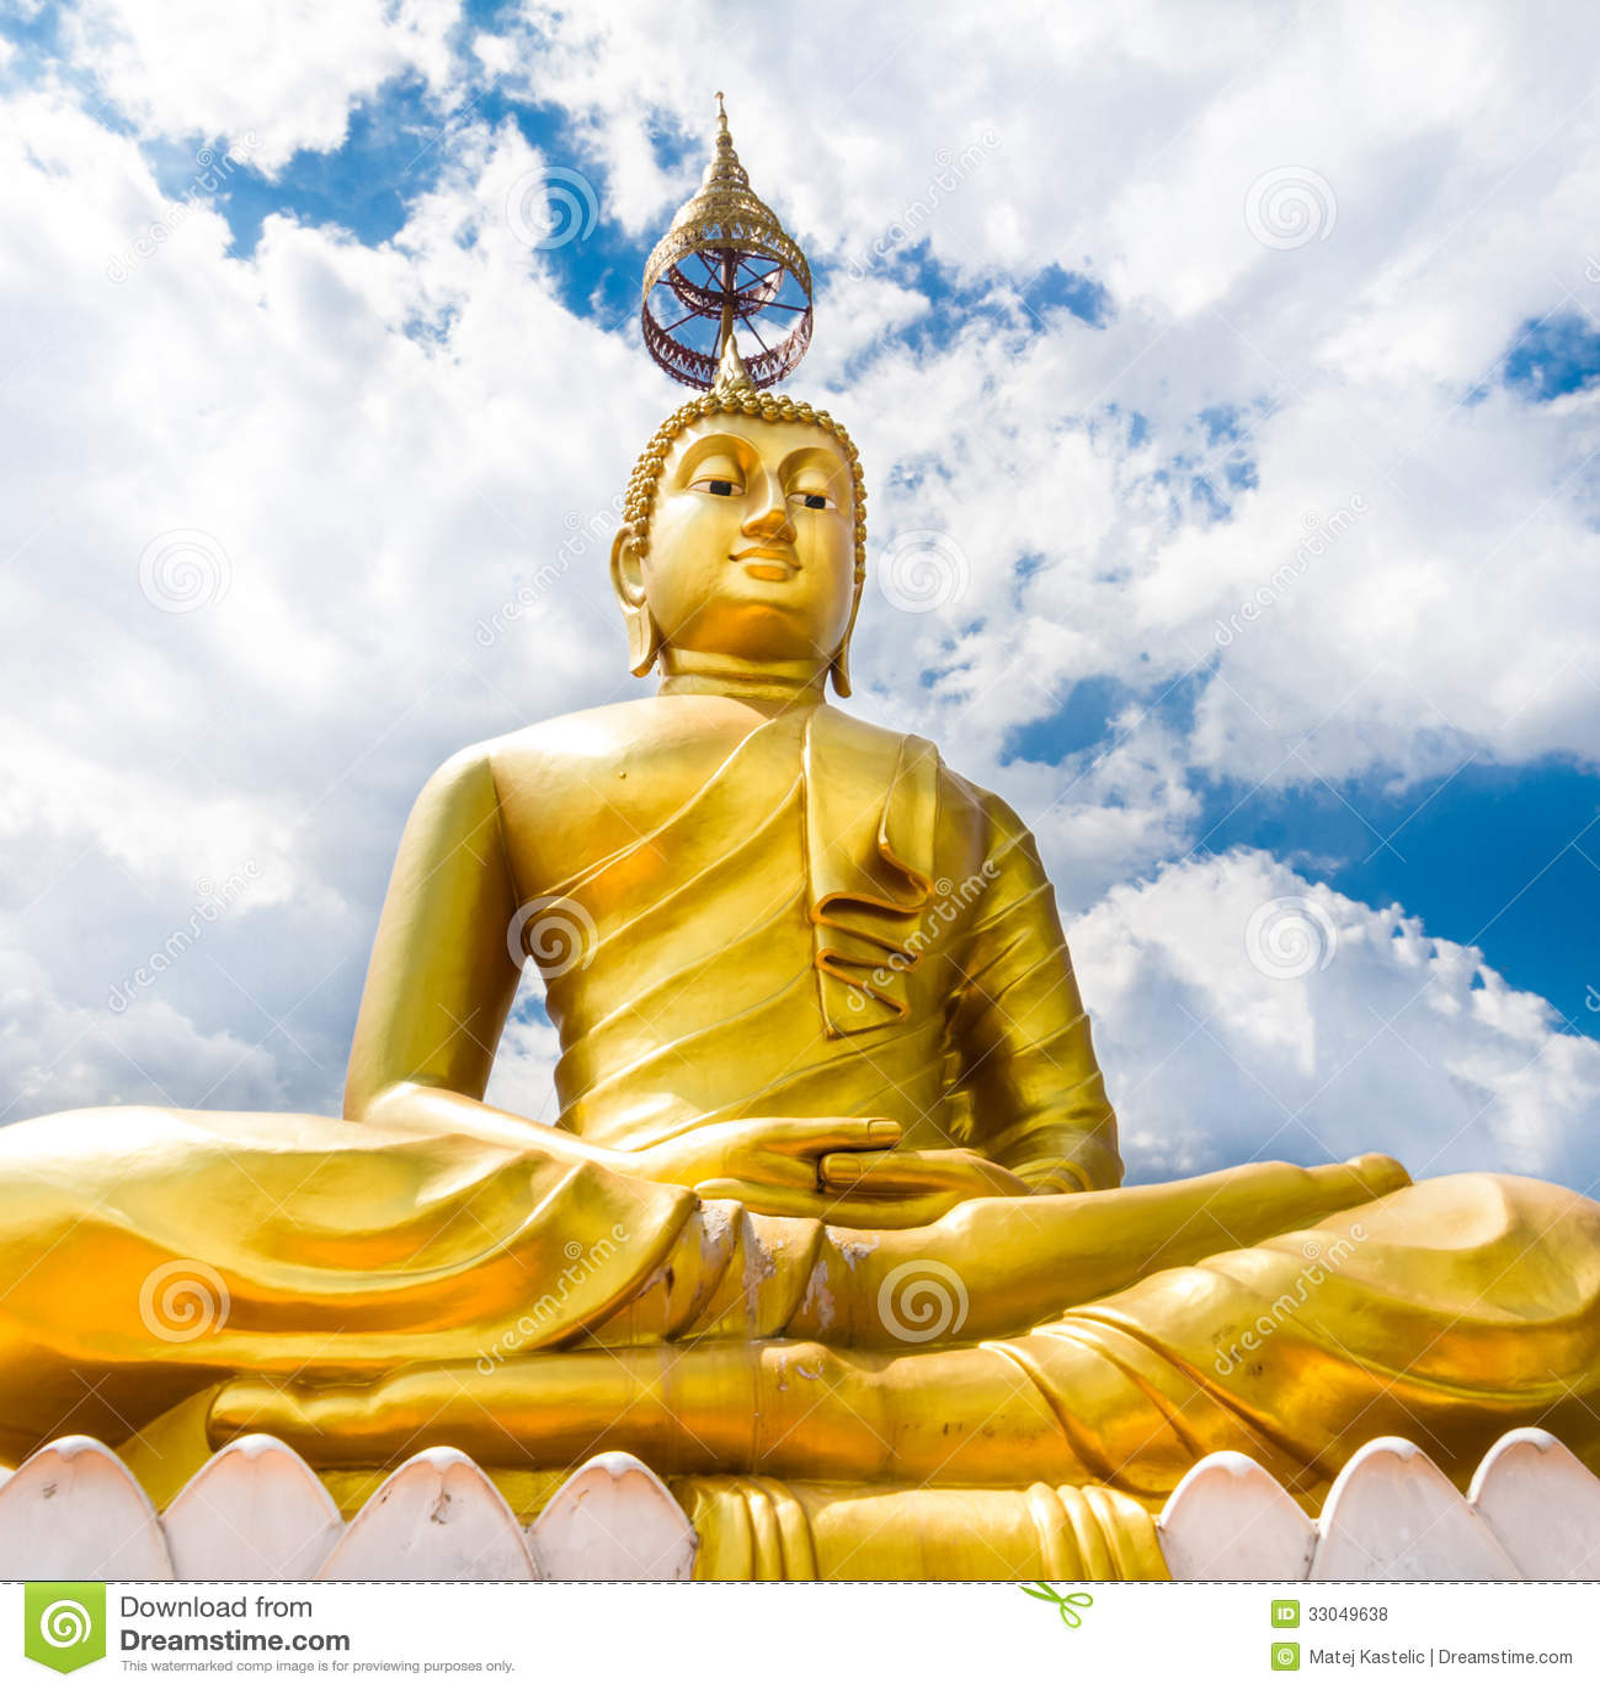 Royalty Free Stock Photos: Buddha statue - Krabi Tiger Cave - Wat Tham ...